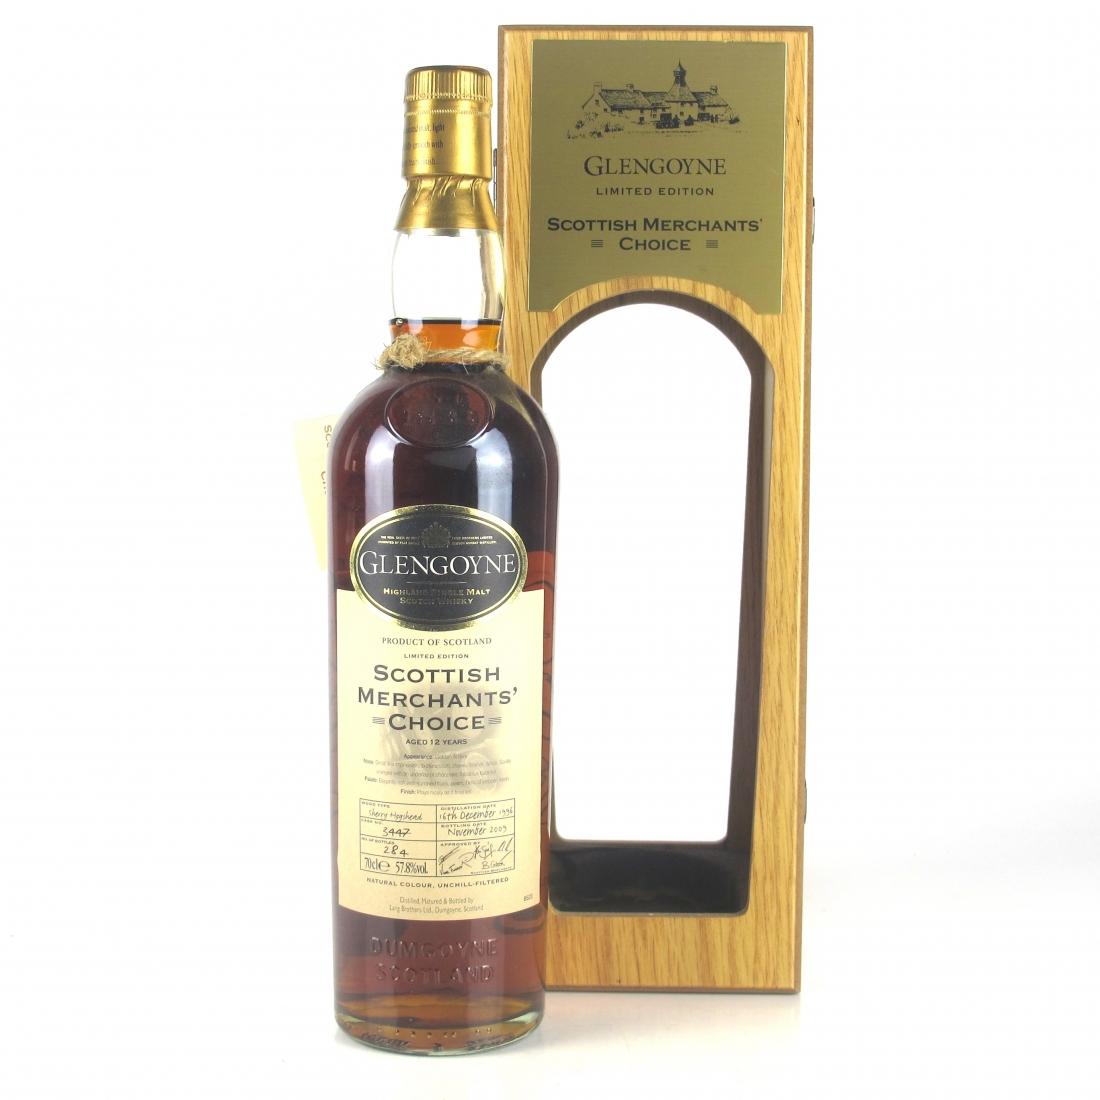 Glengoyne 1996 Scottish Merchants' Choice 12 Year Old